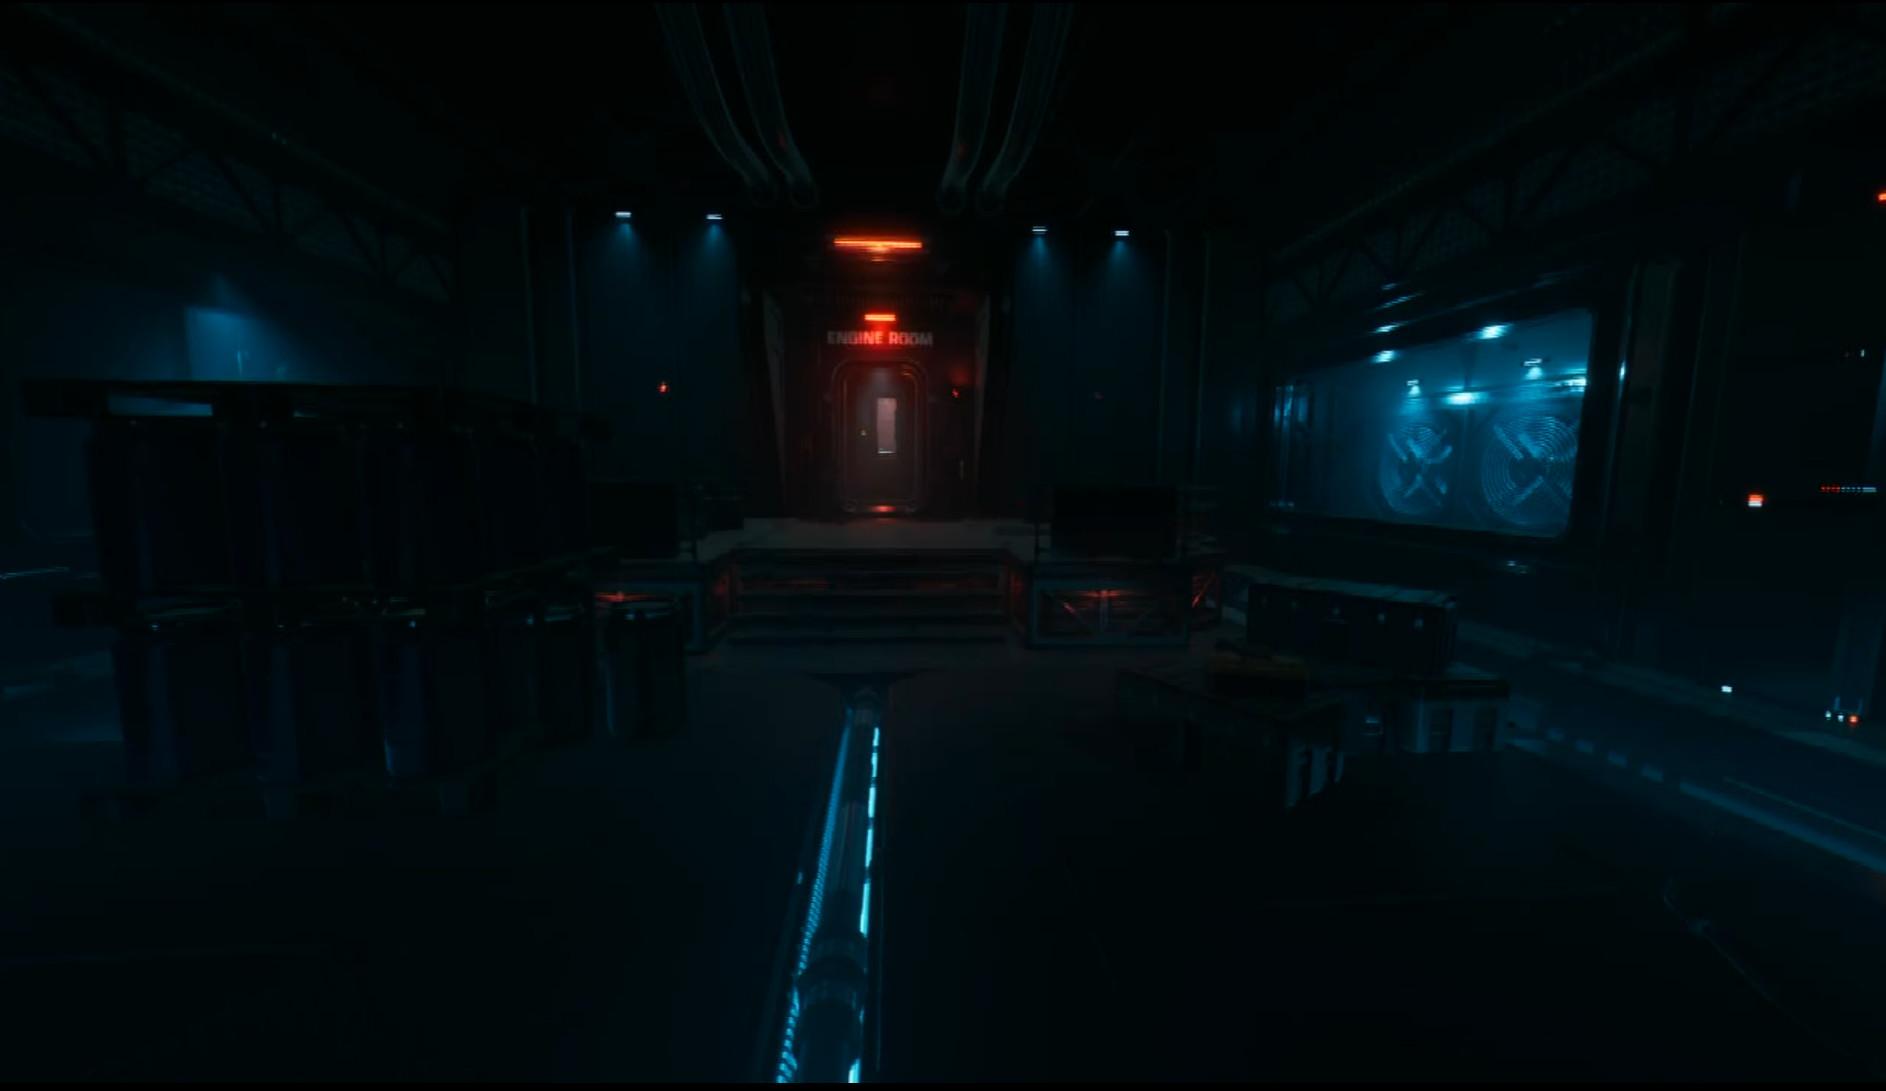 Awaken Realms анонсировала видеоигру Nemesis: Distress —адаптацию настолки «Немезида» 2